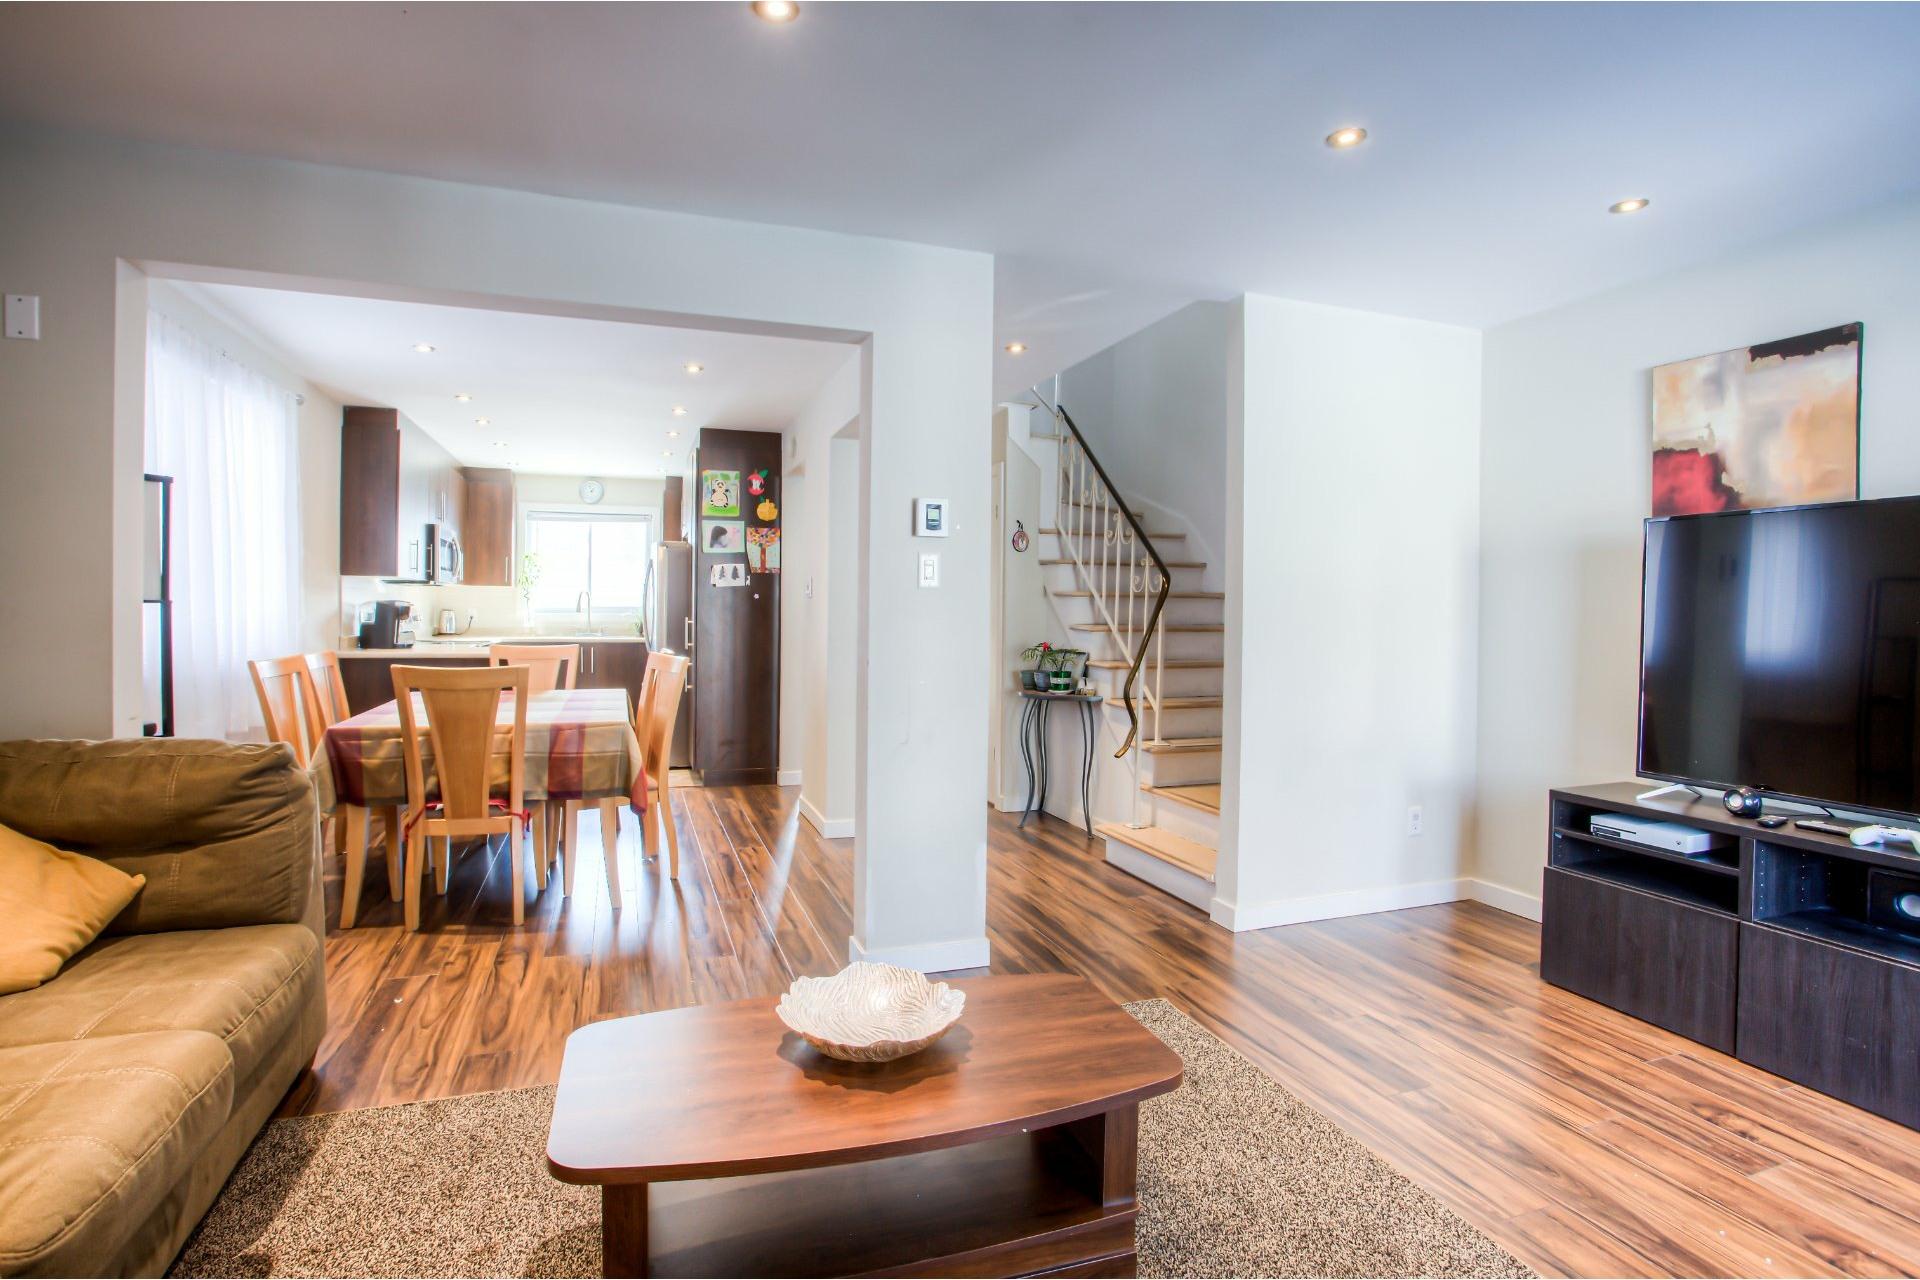 image 13 - House For rent Pierrefonds-Roxboro Montréal  - 9 rooms